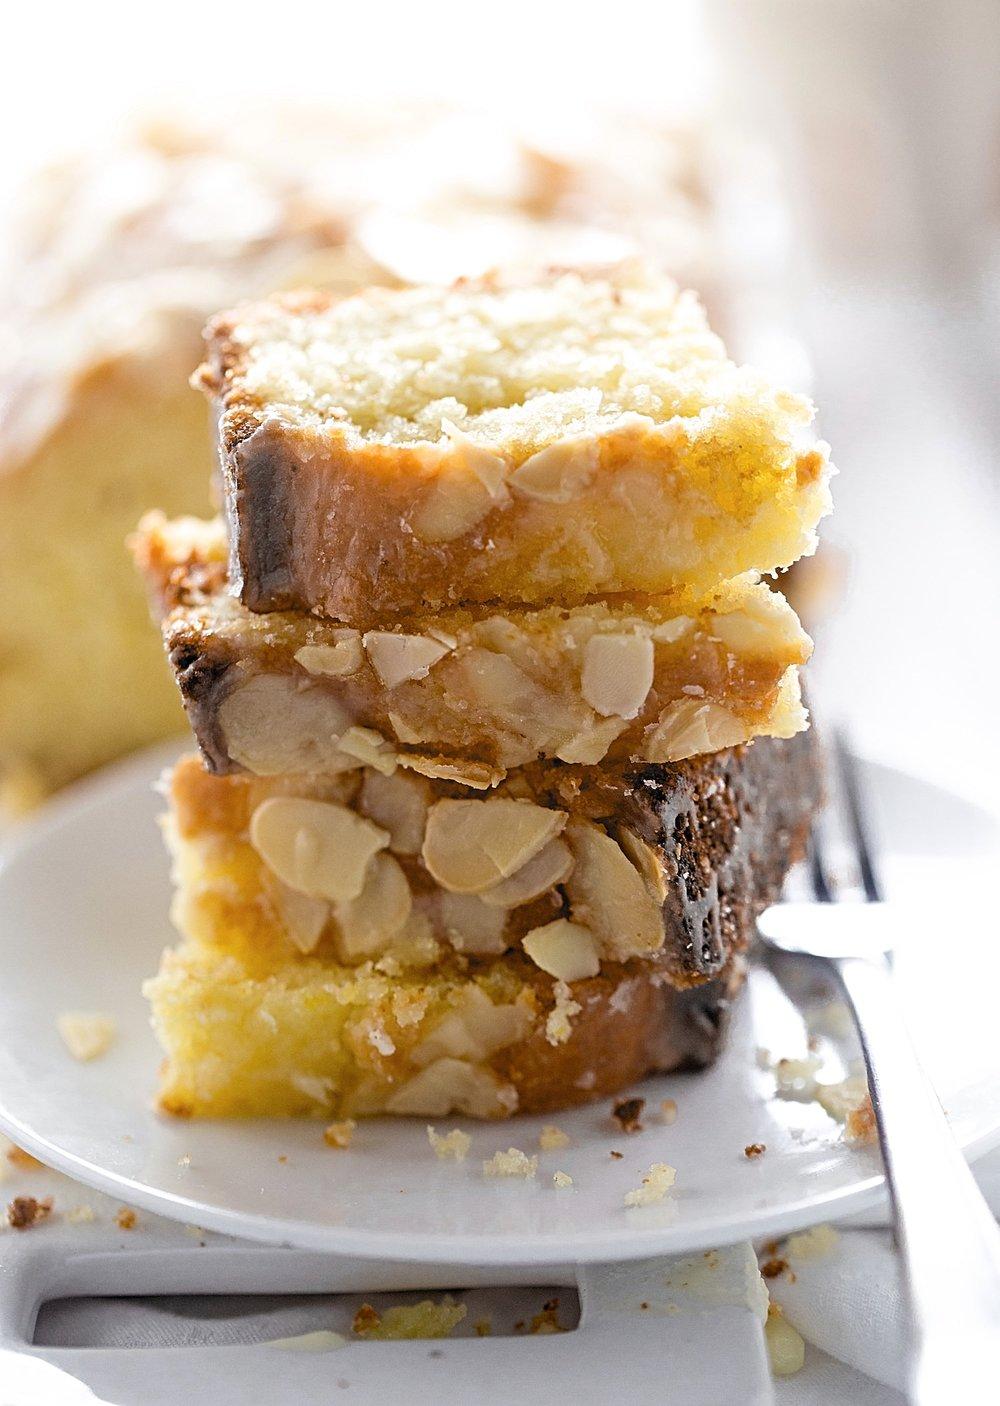 Moist Orange Almond Loaf Cake: super easy, soft, moist orange cake with a hint of almond flavor and a sweet orange glaze. | TrufflesandTrends.com